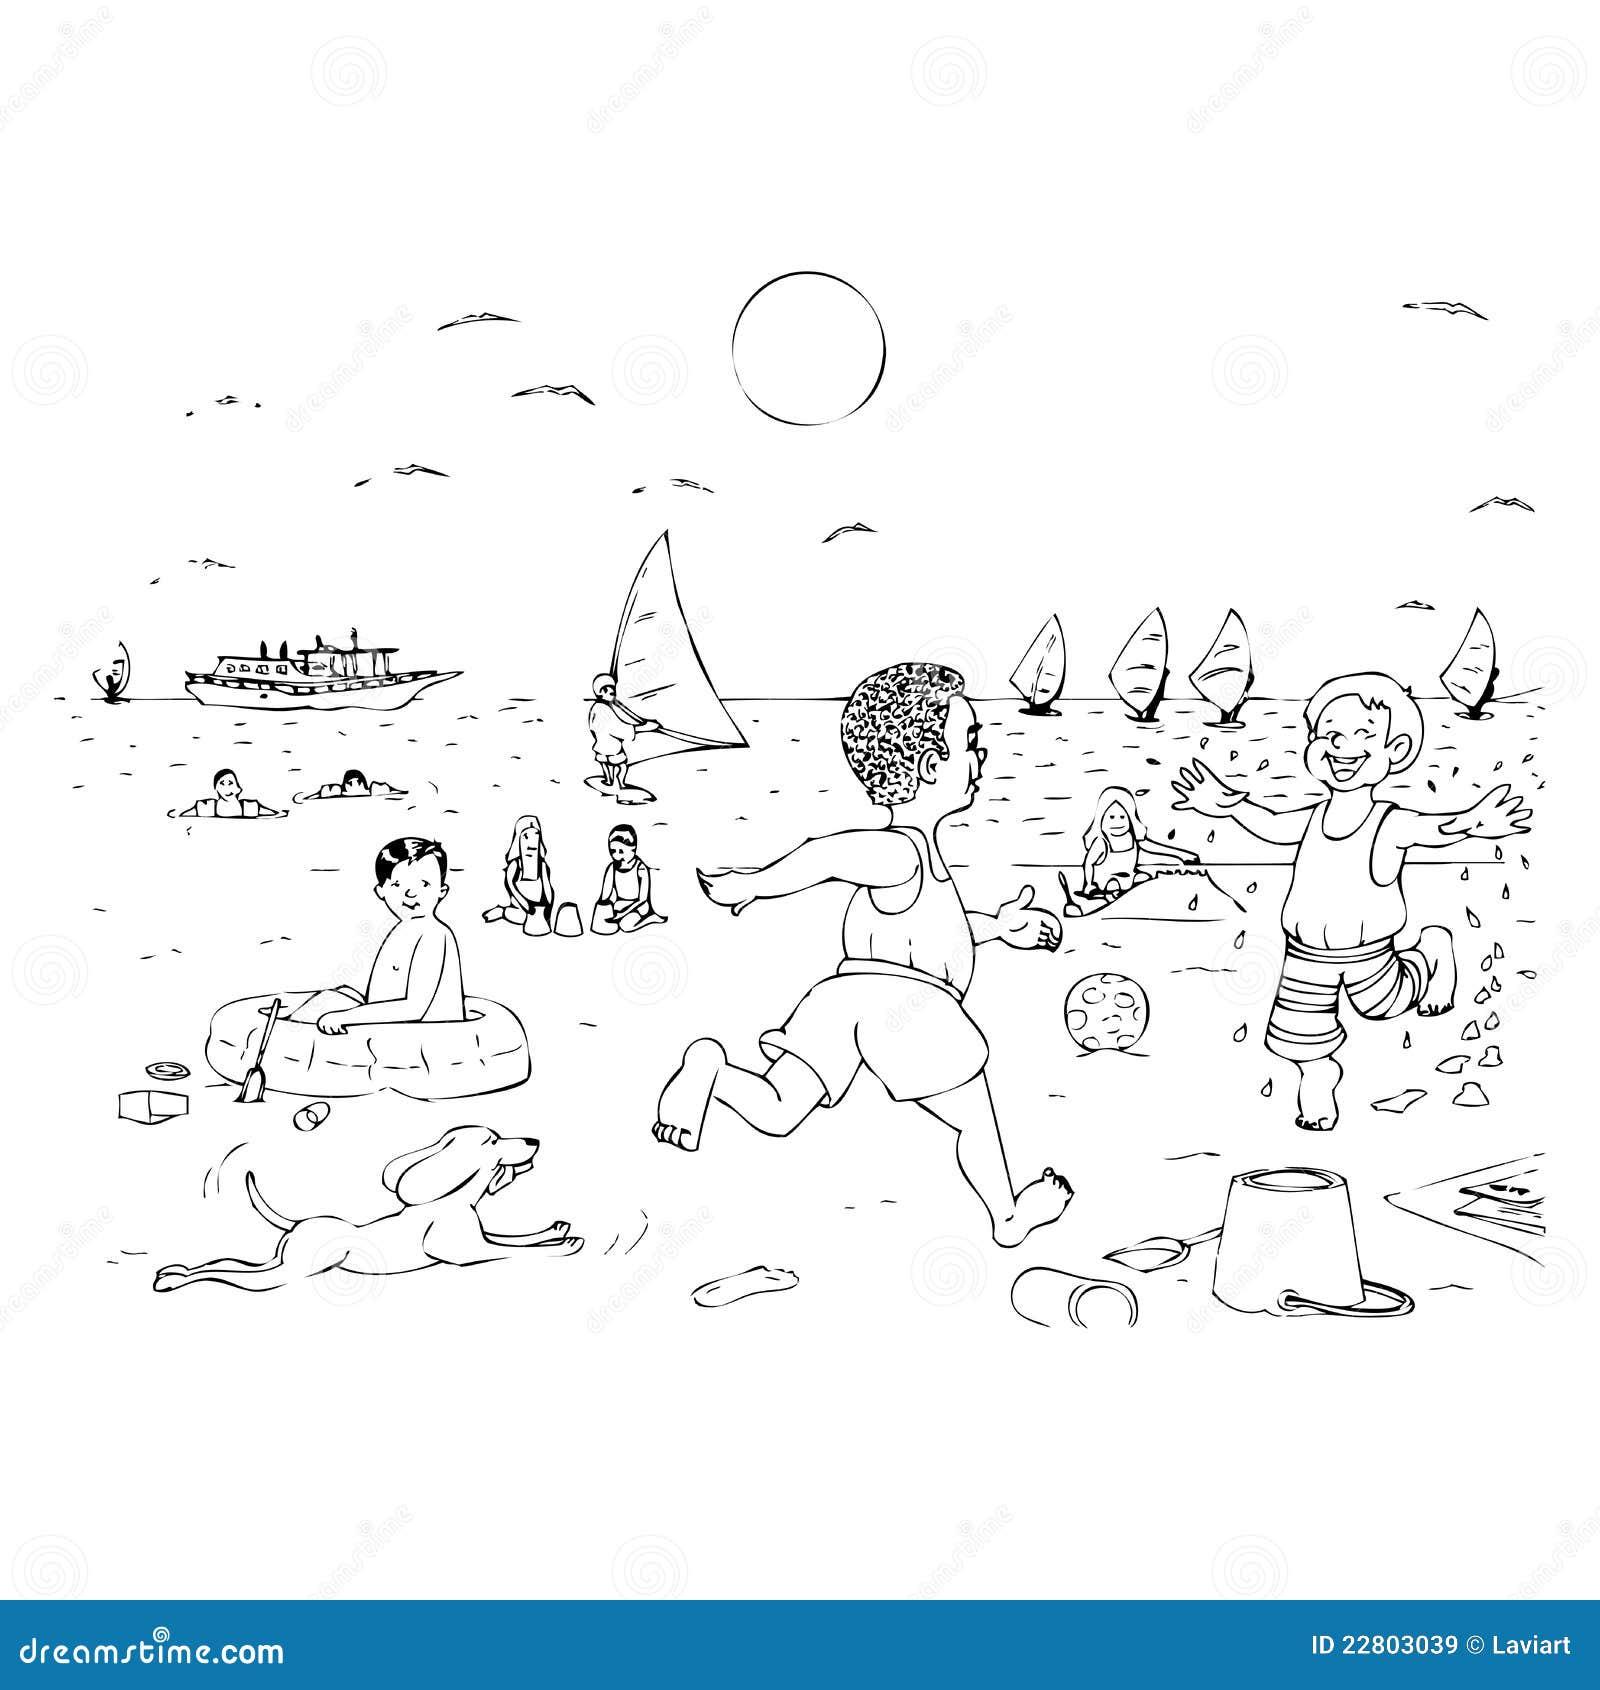 children playing on the beach stock illustration - illustration of